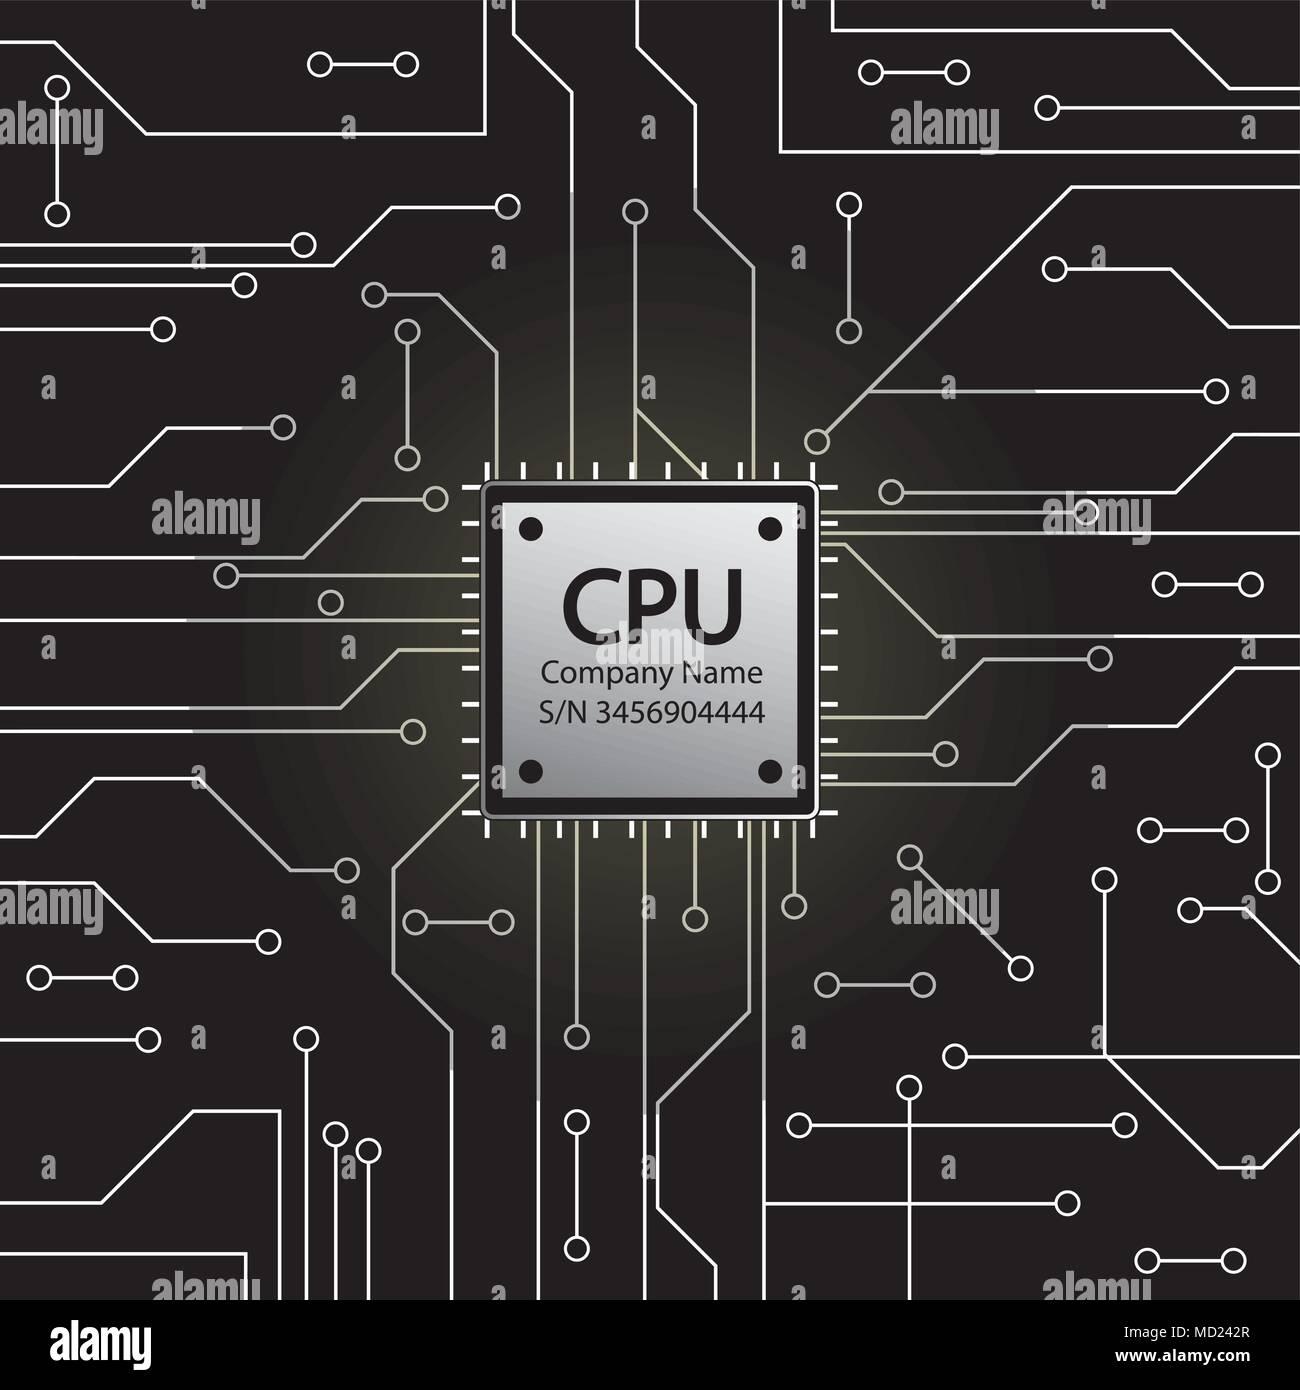 Cpu Microprocessor Microchip And Circuit Board Stock Vector Diagram Of A Illustration